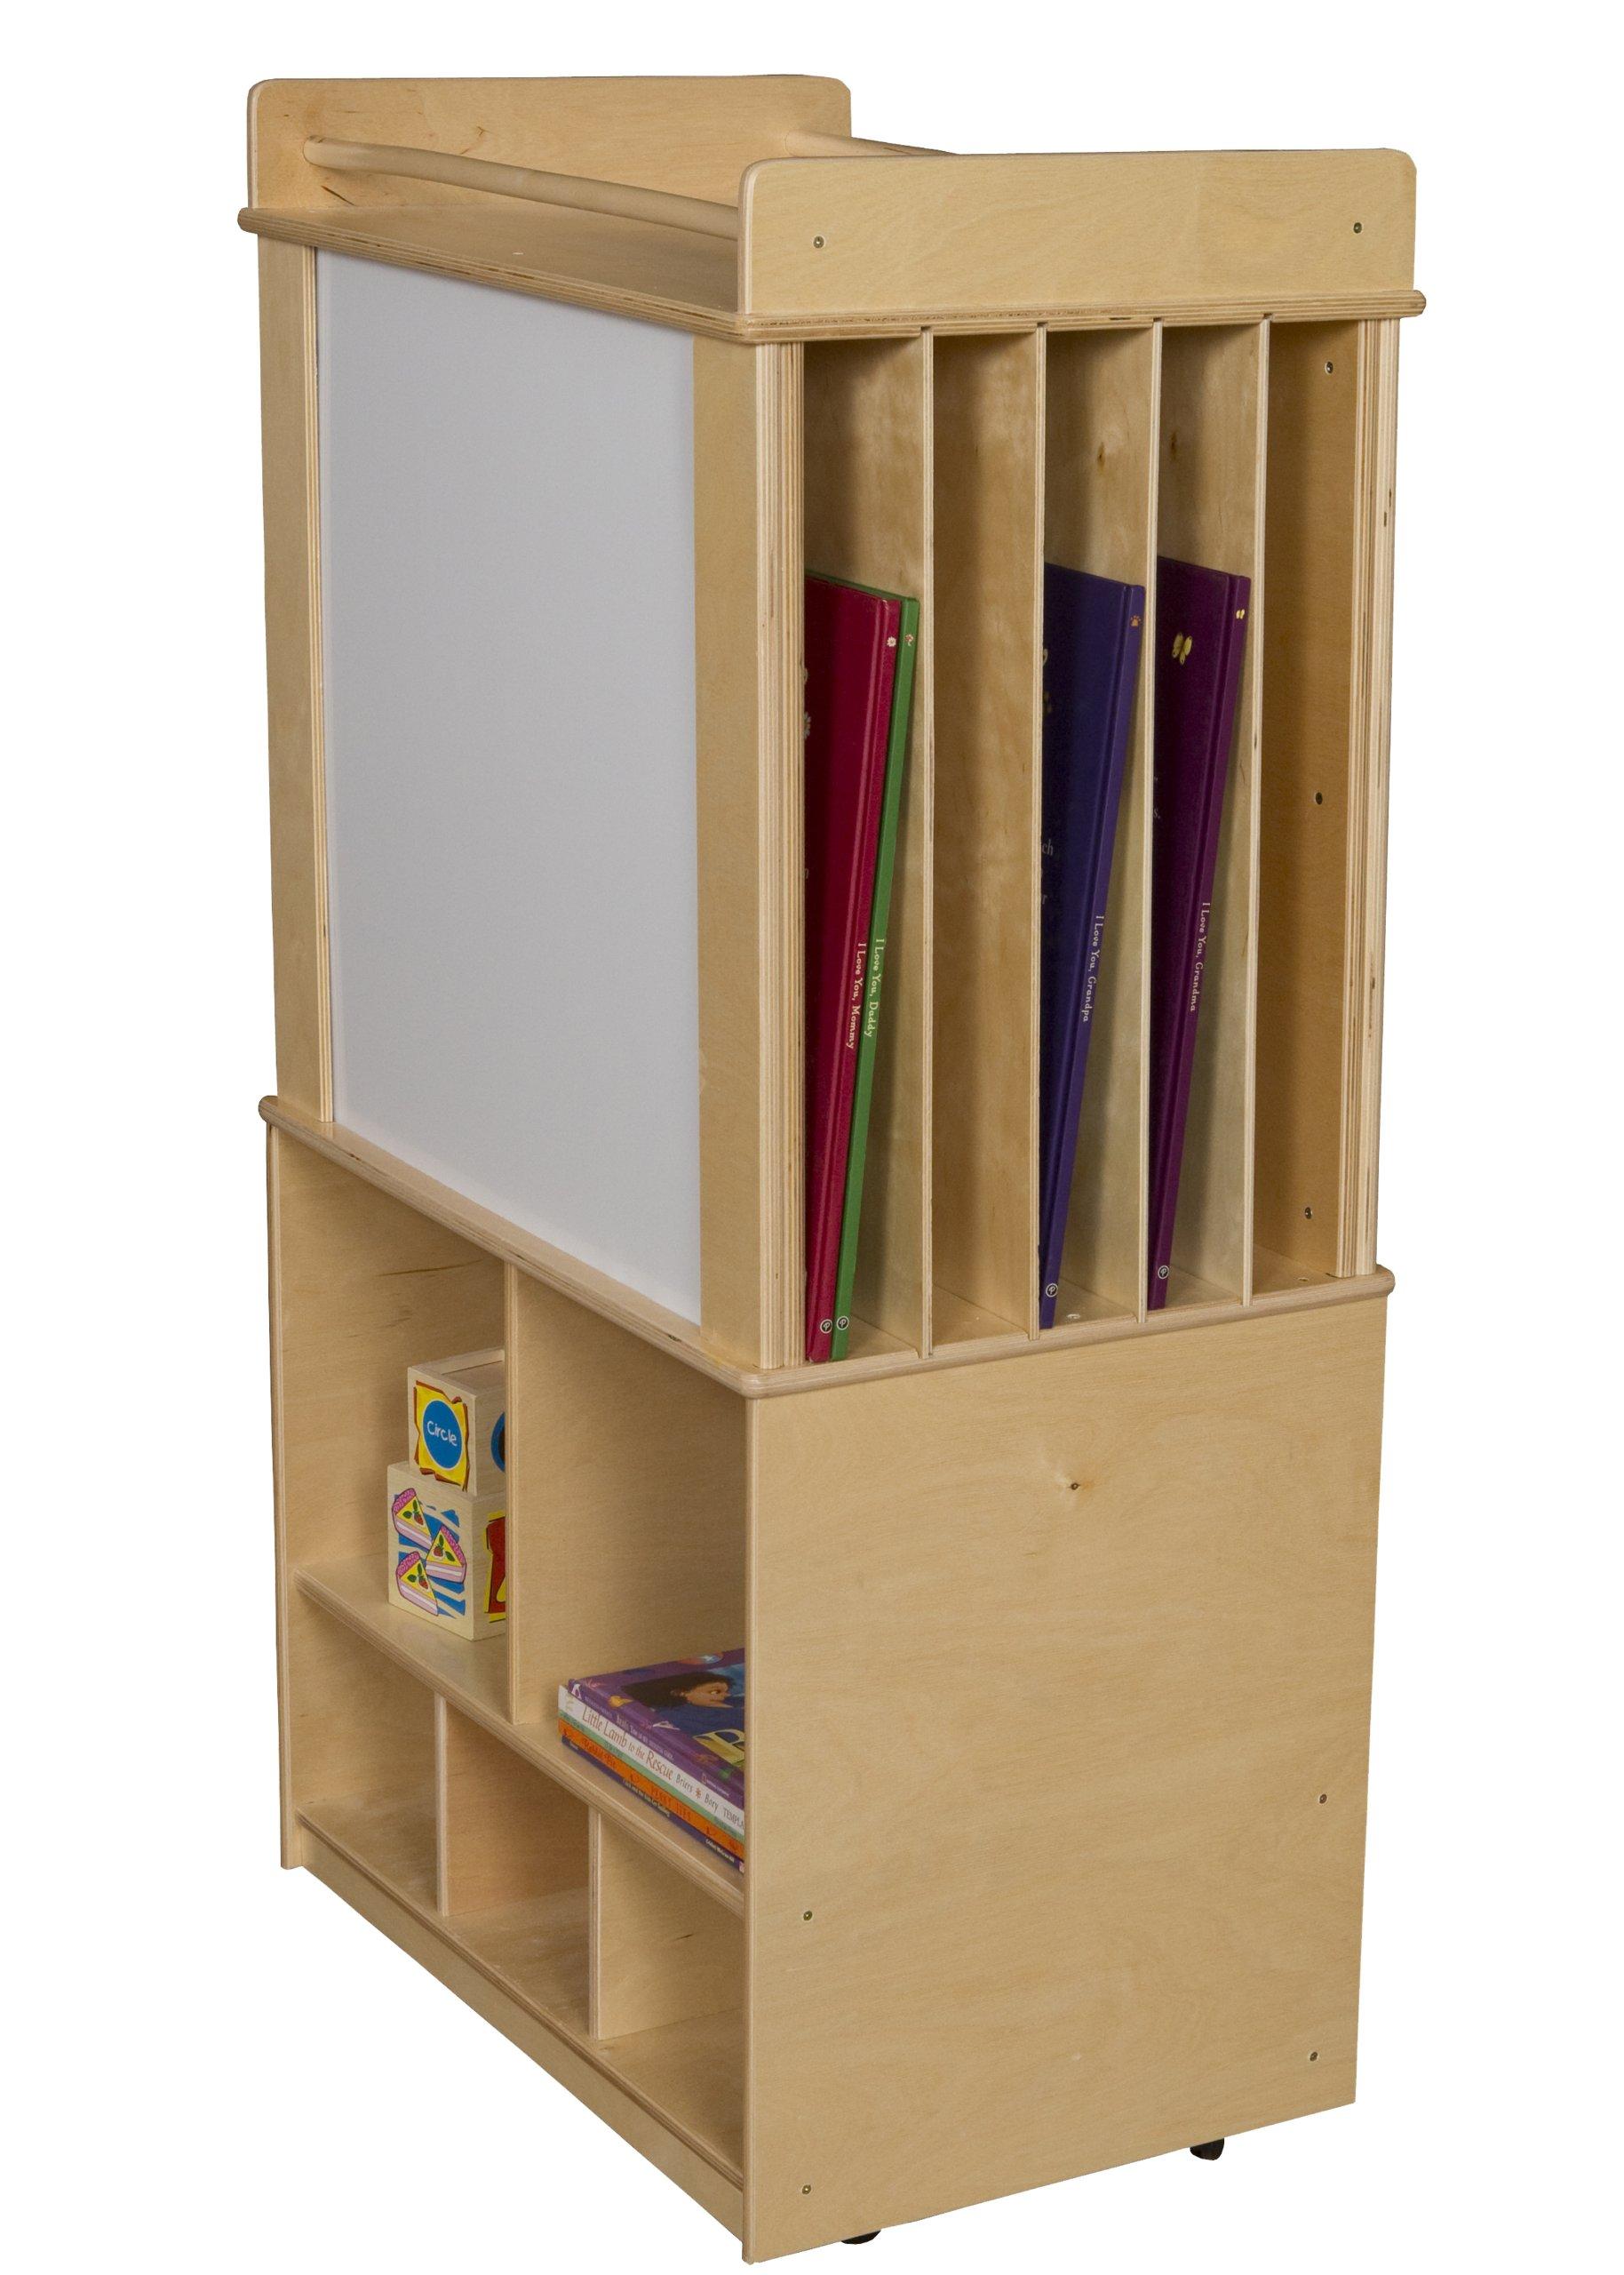 Wood Designs WD99549 Store-It-All Teaching Center w/ot Trays